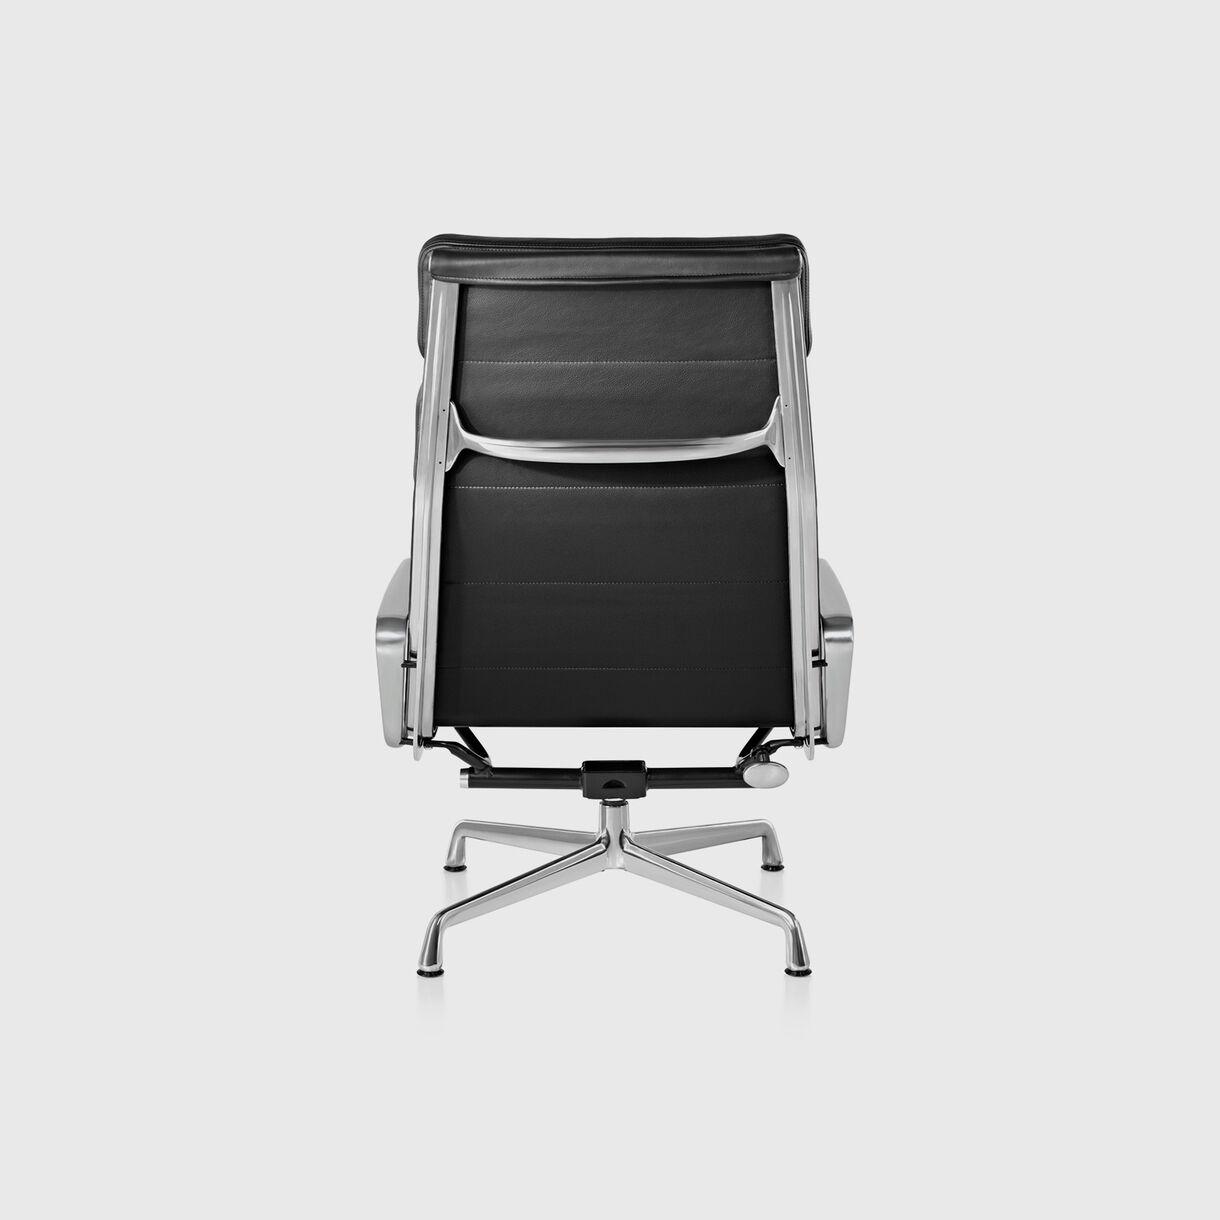 Eames Soft Pad Lounge Chair, 4 Cushions, Black Leather & Polished Aluminium